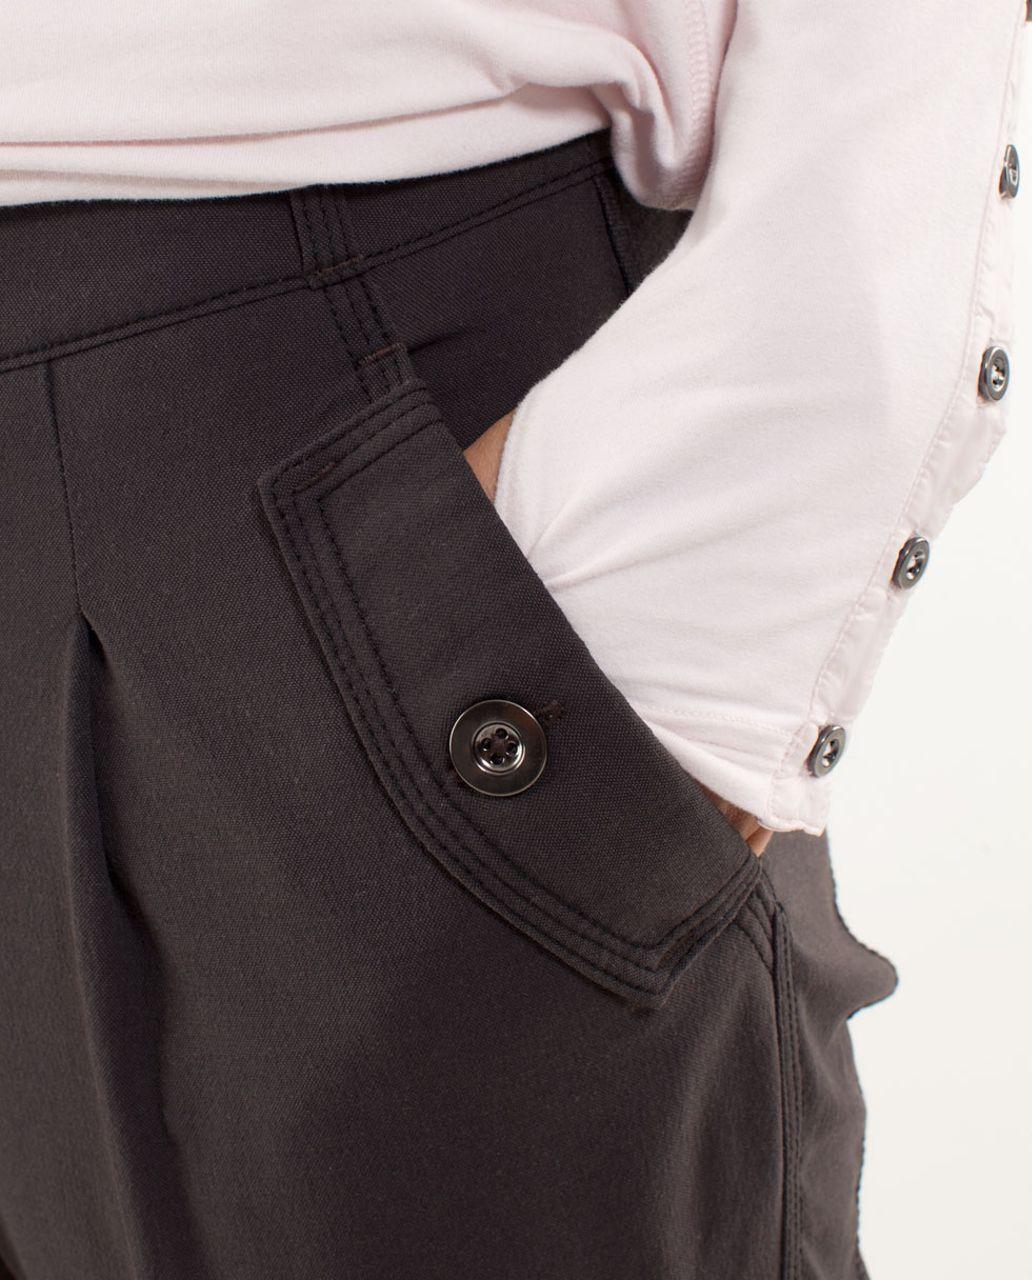 Lululemon Pedal Power Pant - Black